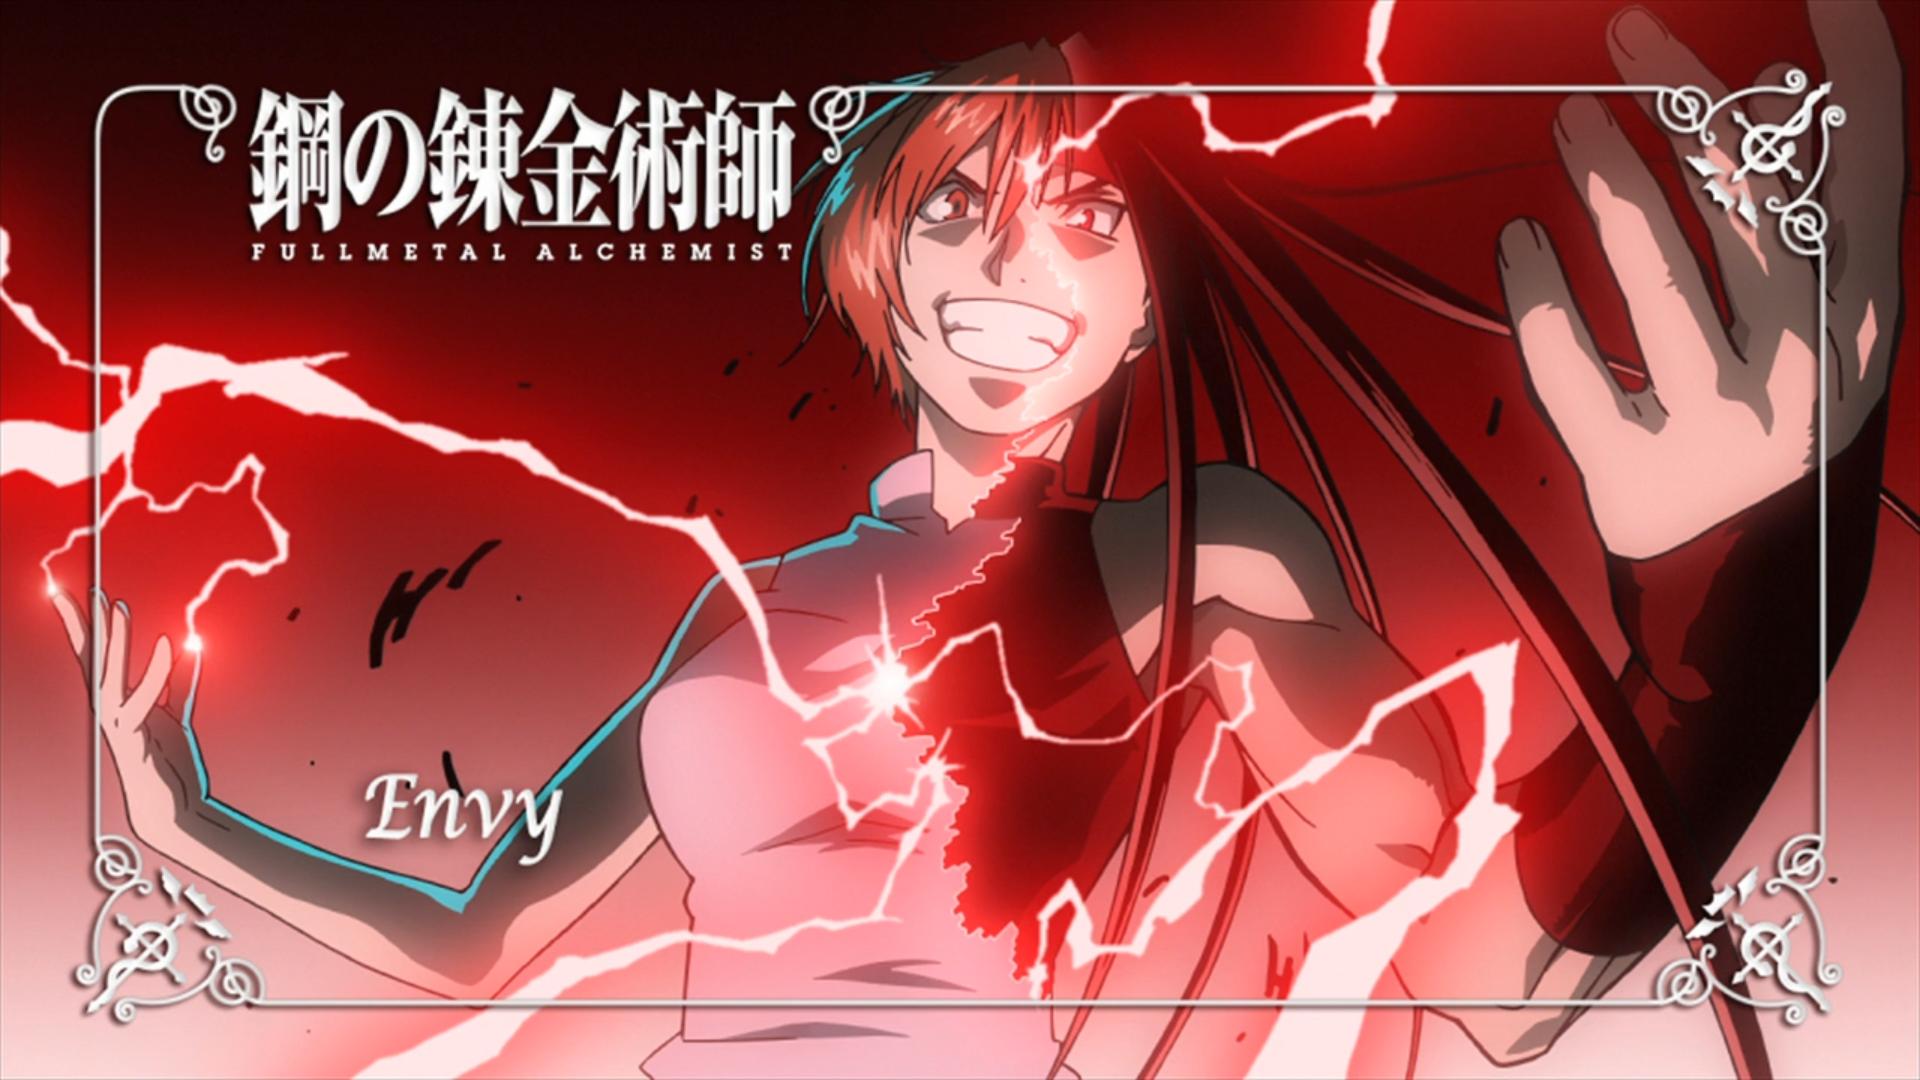 Illustration Anime Cartoon Fullmetal Alchemist Brotherhood Envy Font Organ Mangaka Comic Book